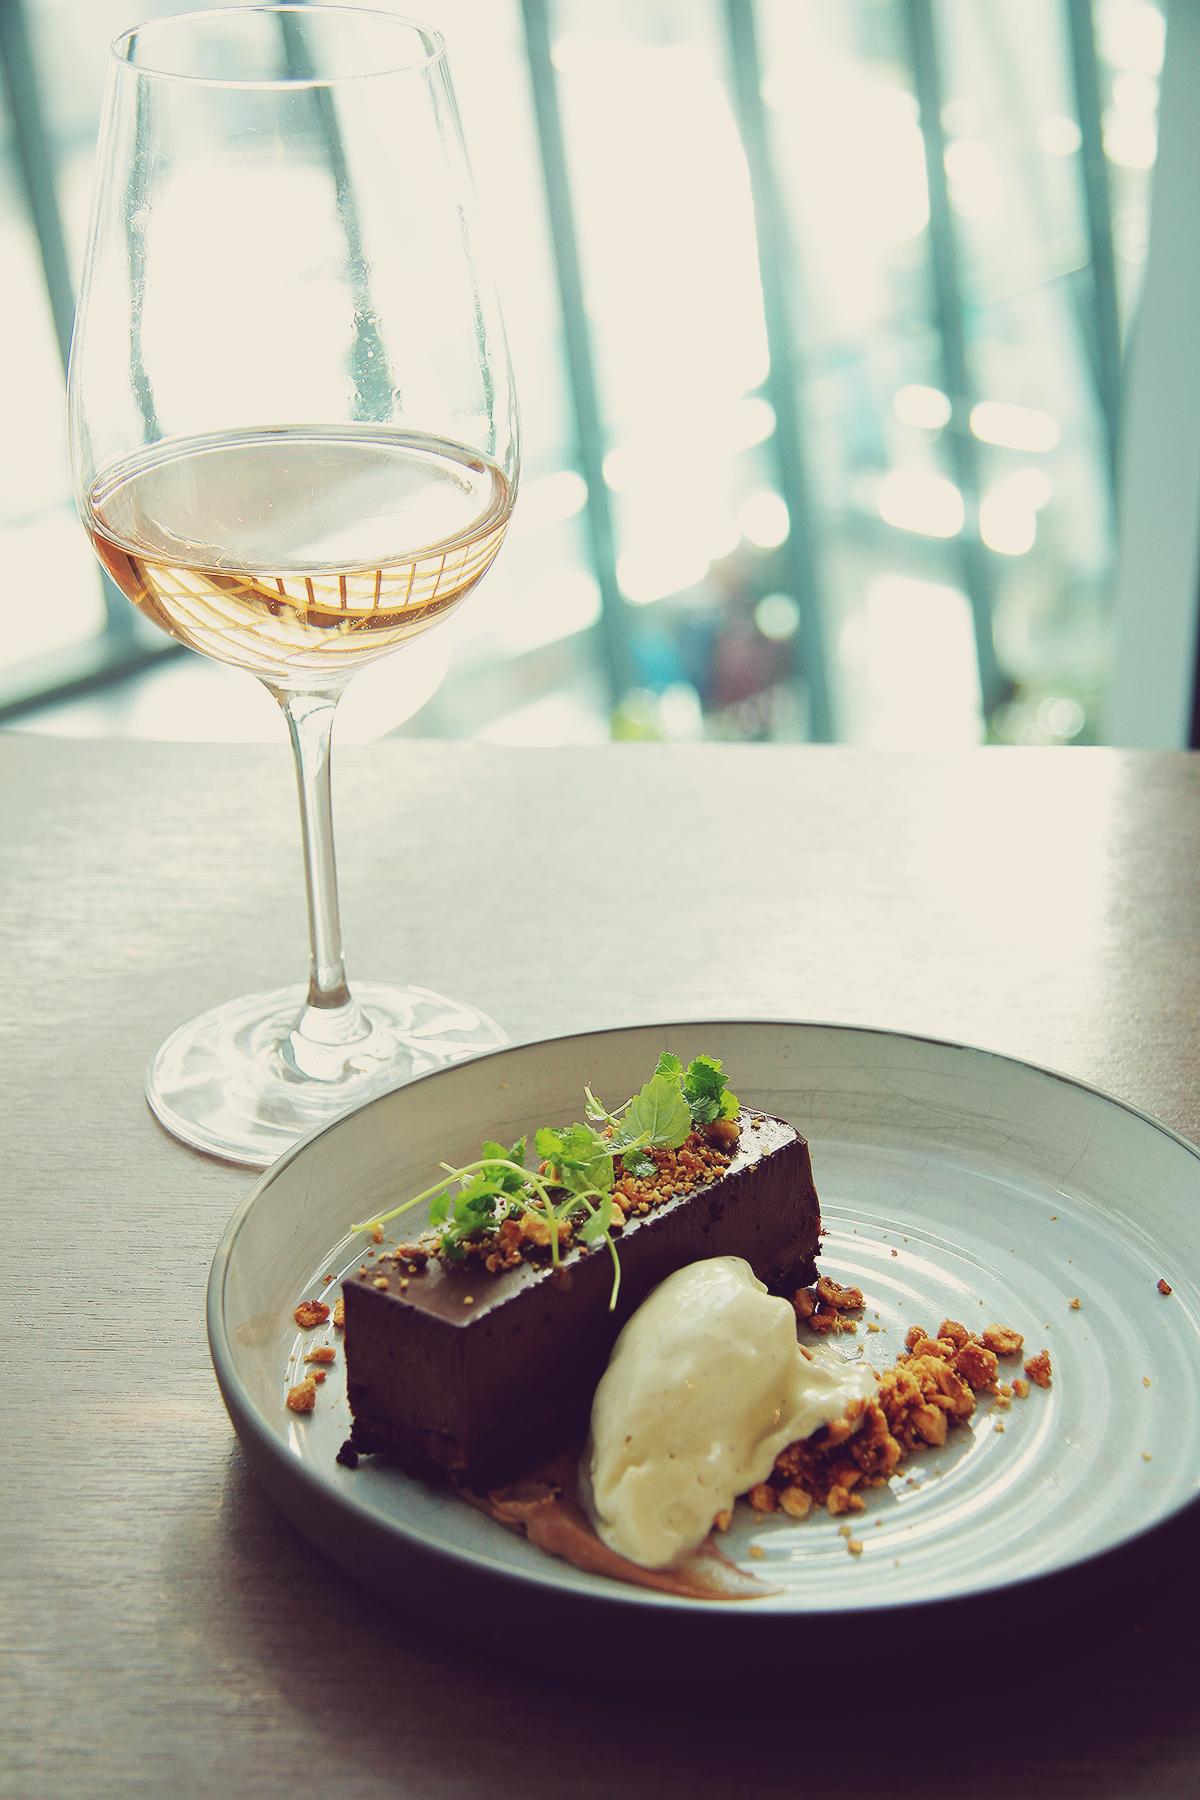 london-dessert-at-darwin-brasserie-at-sky-garden